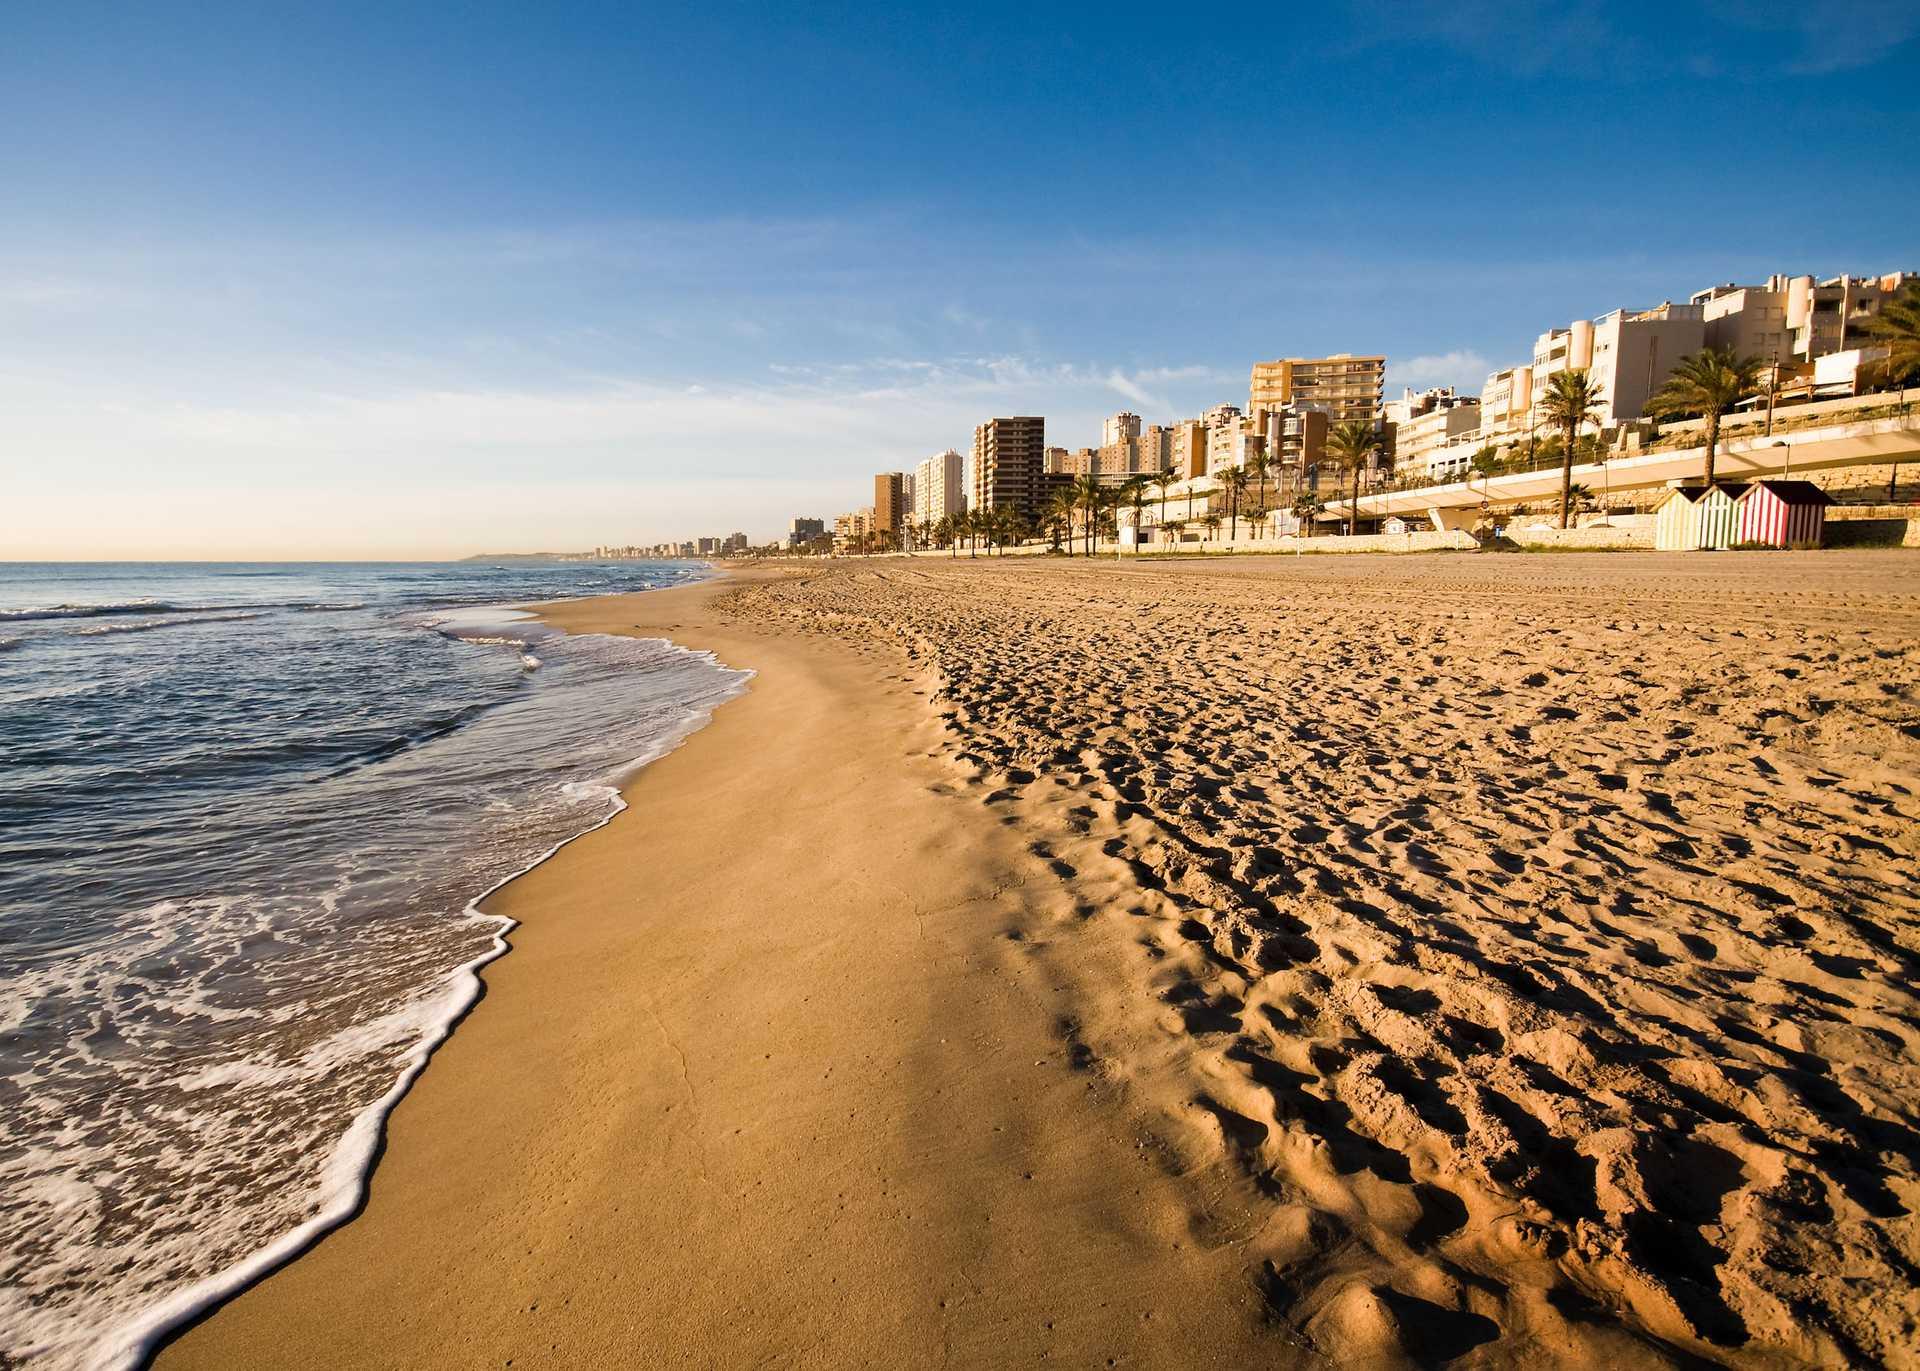 Playa de Muchavista